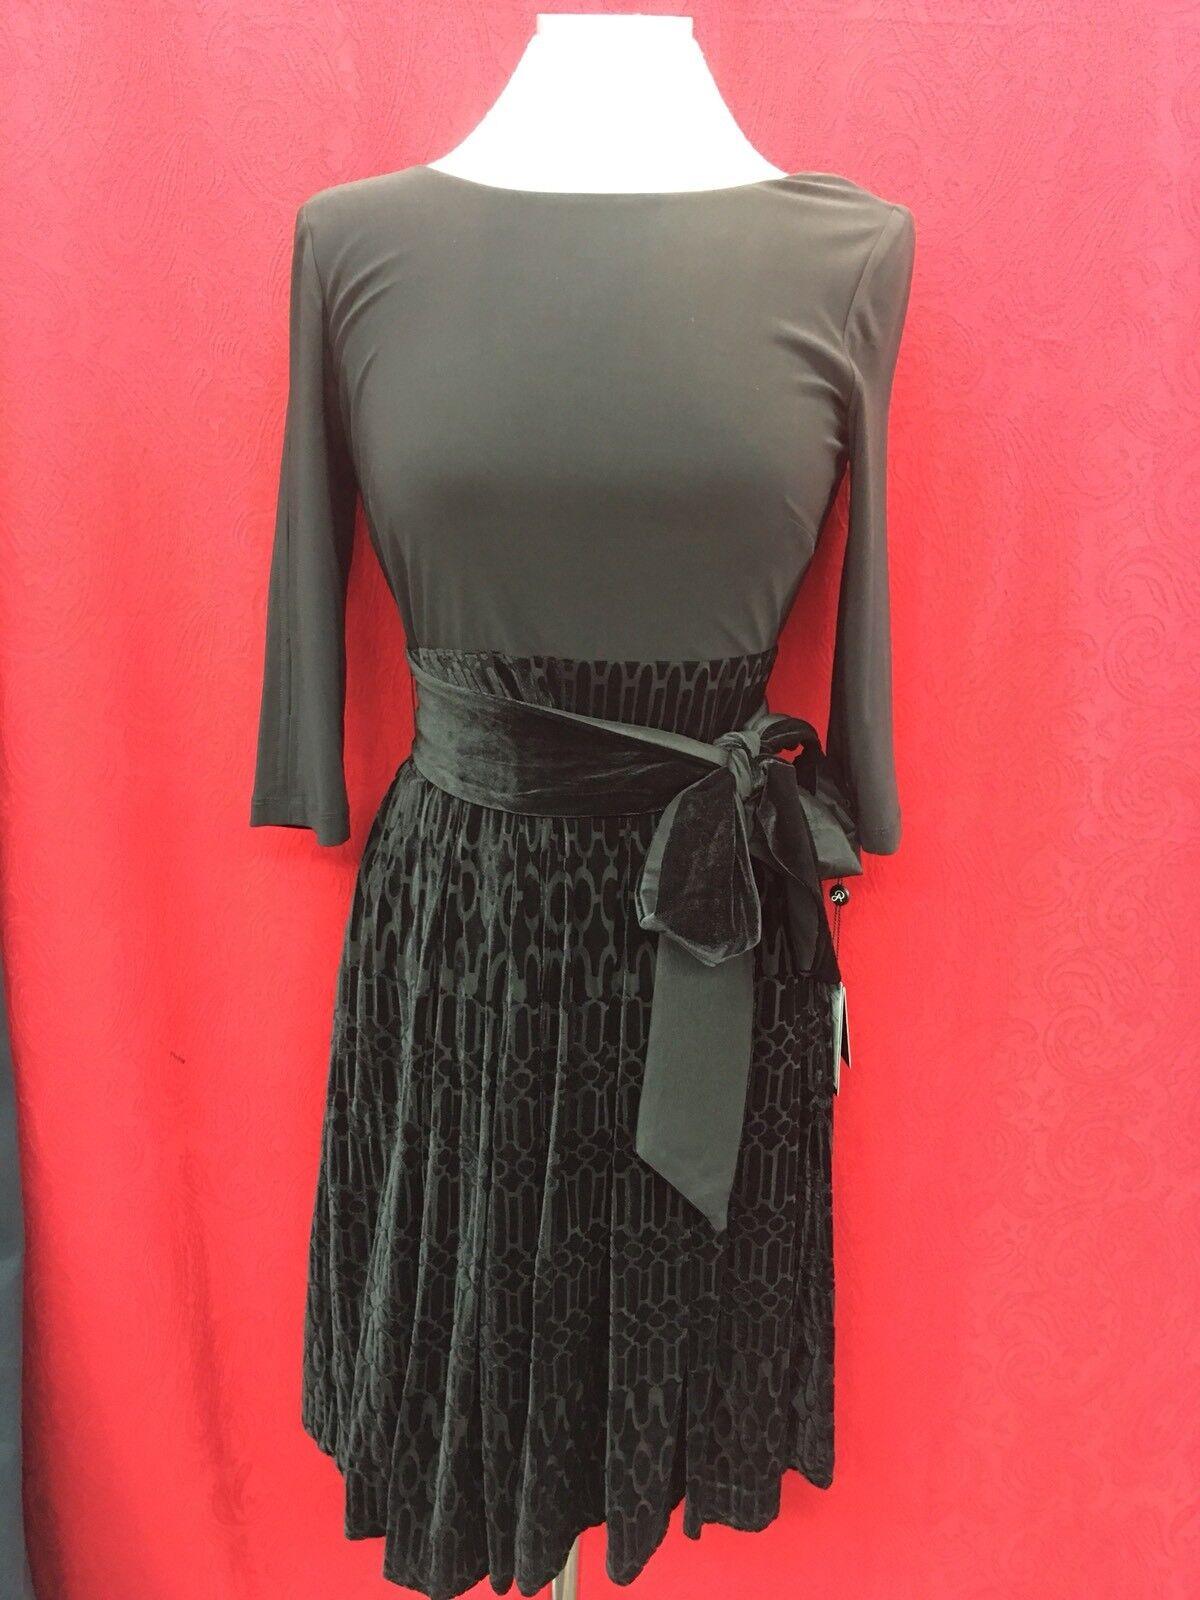 Adrianna Papell Kleid   Velvet Hosen   Größe10   Einzelhandel Schulter   LENGTH39